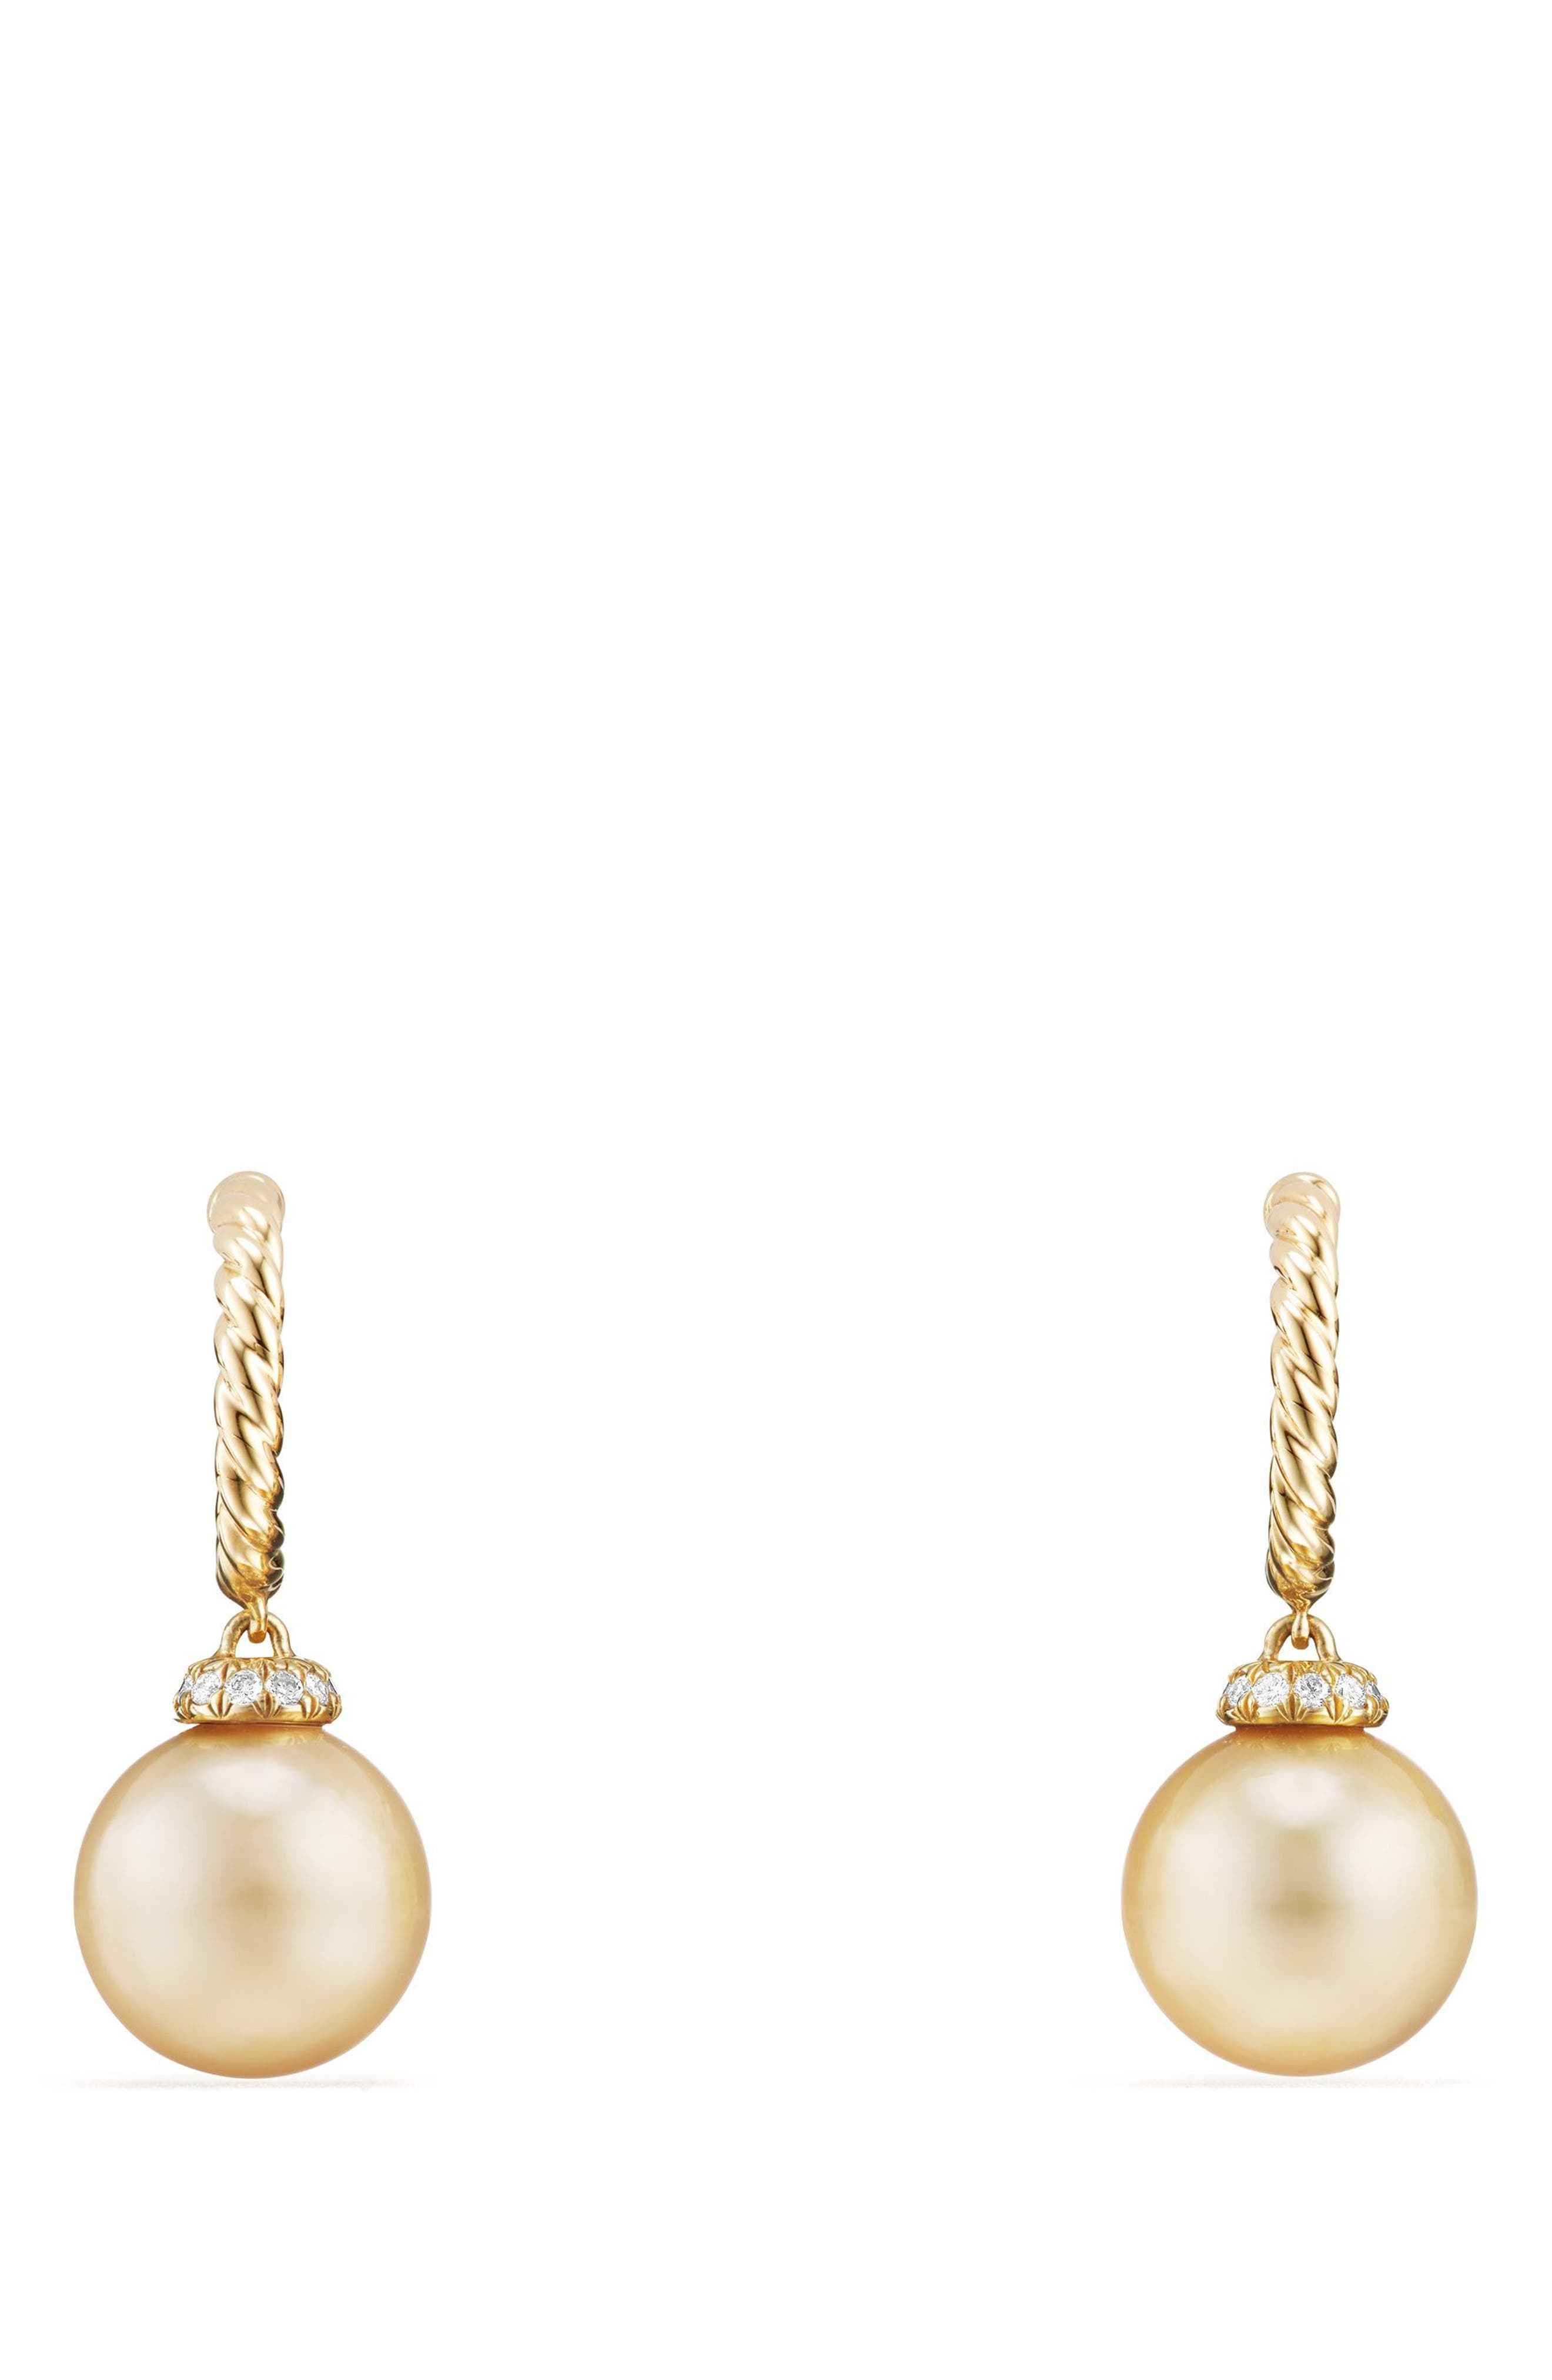 Solari Hoop Earrings with Diamonds and Genuine Pearl,                             Main thumbnail 1, color,                             Gold/ Diamond/ Yellow Pearl